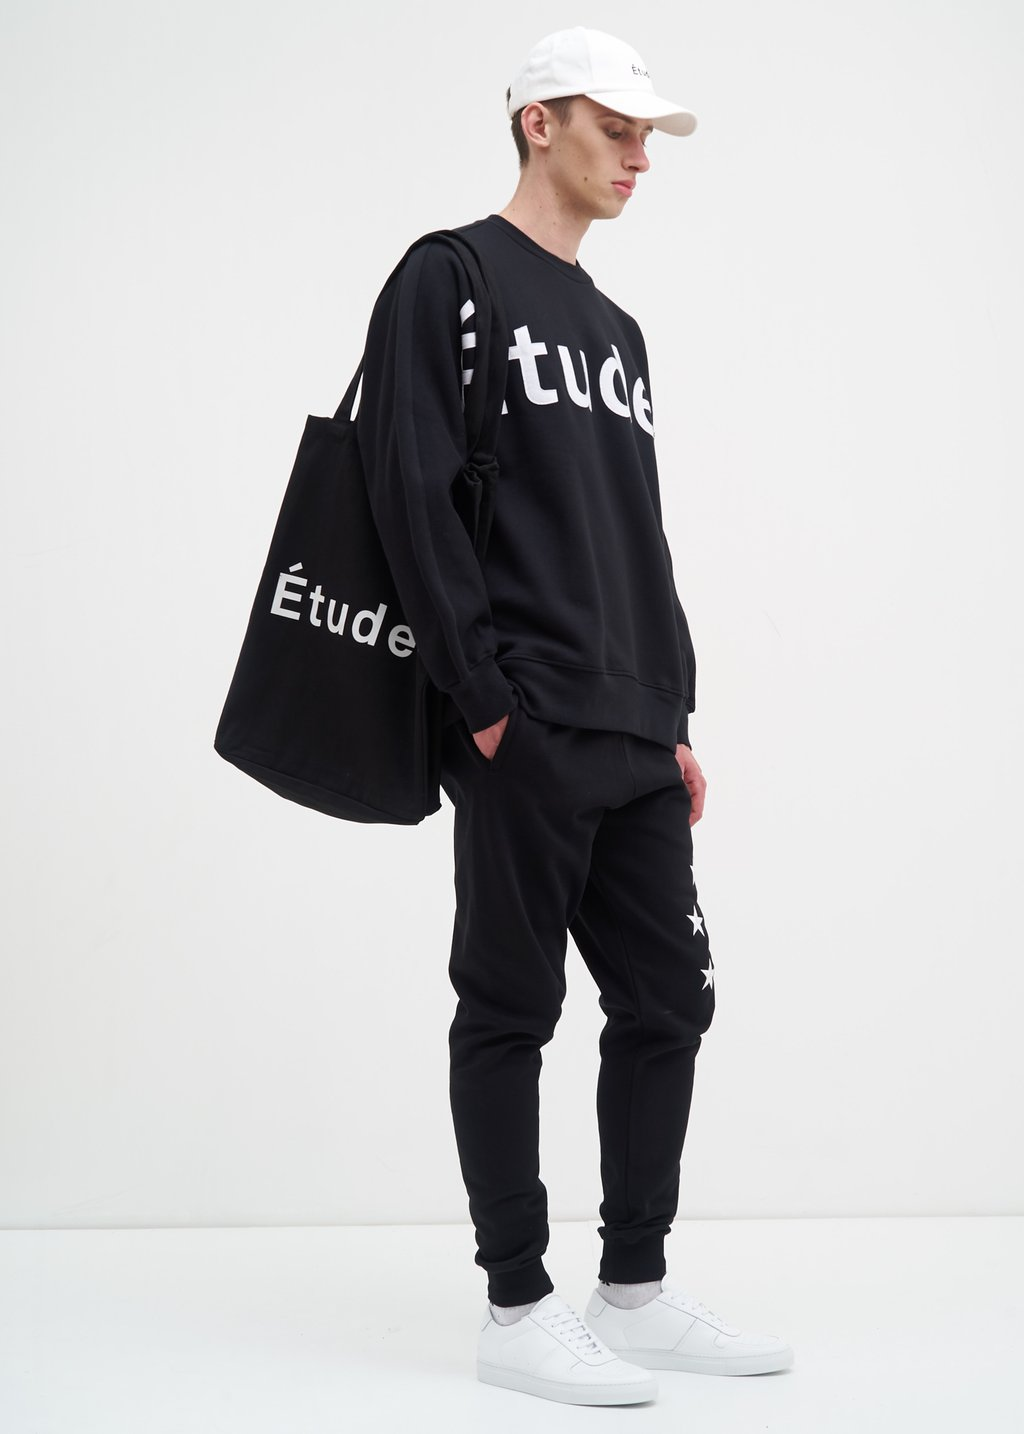 Etudes_Black_Color_Etudes_Sweatshirt-6_1024x.jpg